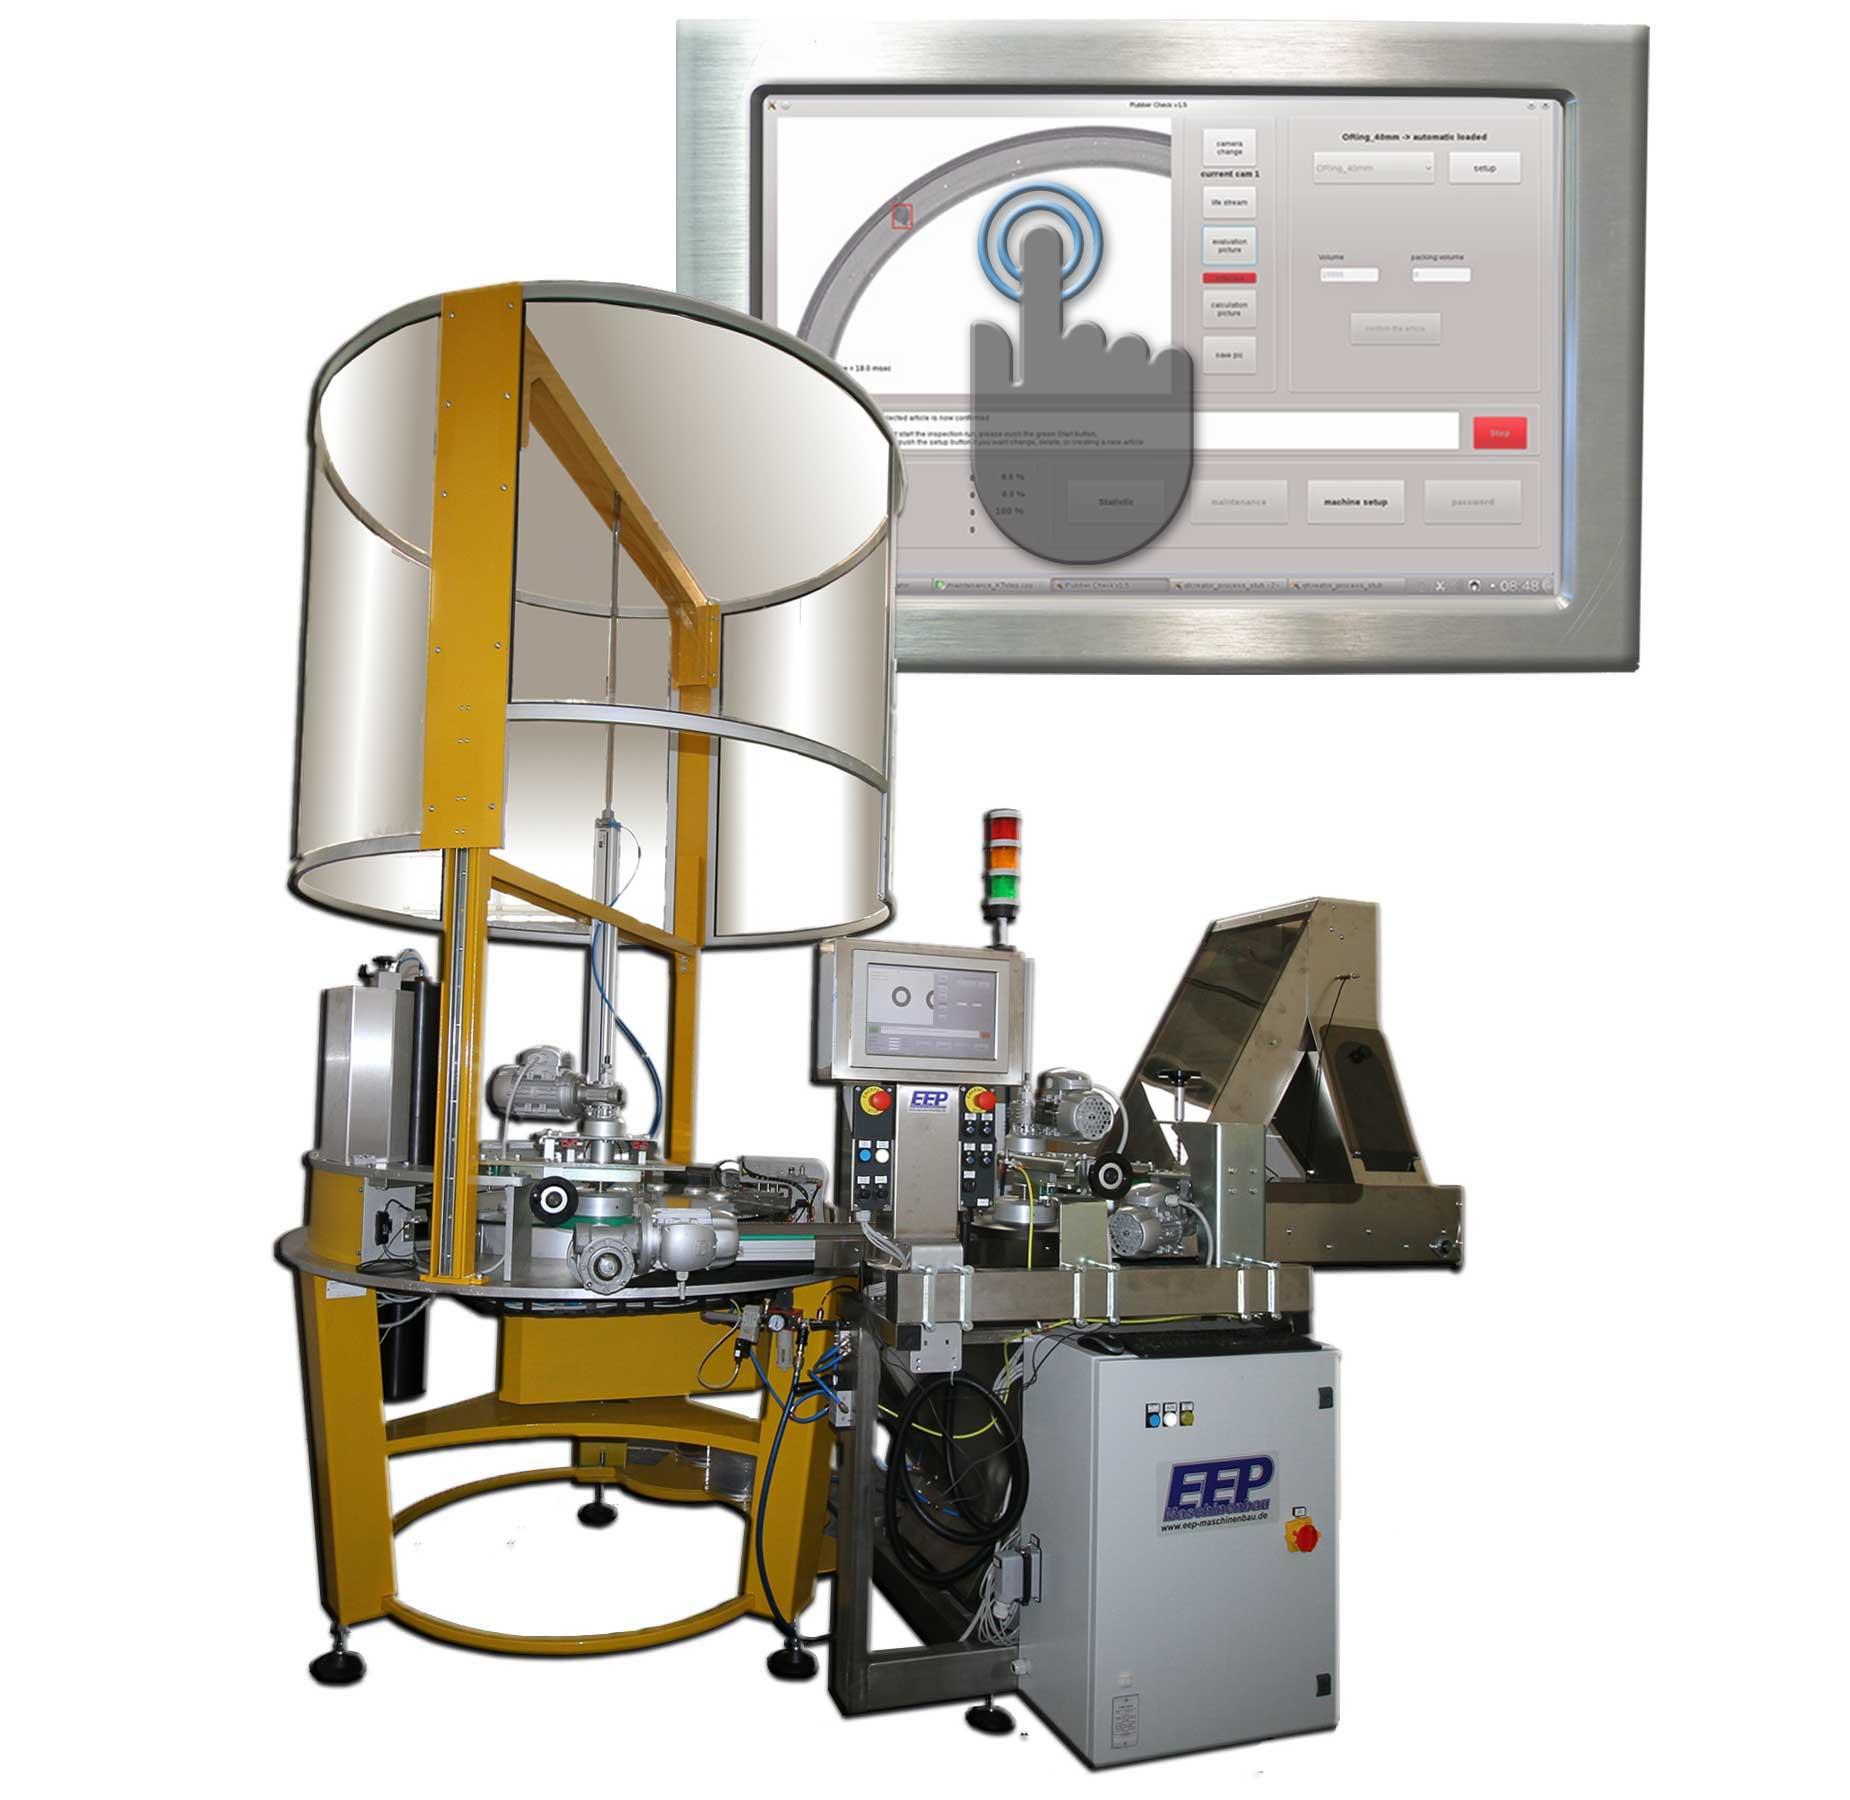 KTprime - EEP Maschinenbau GmbH